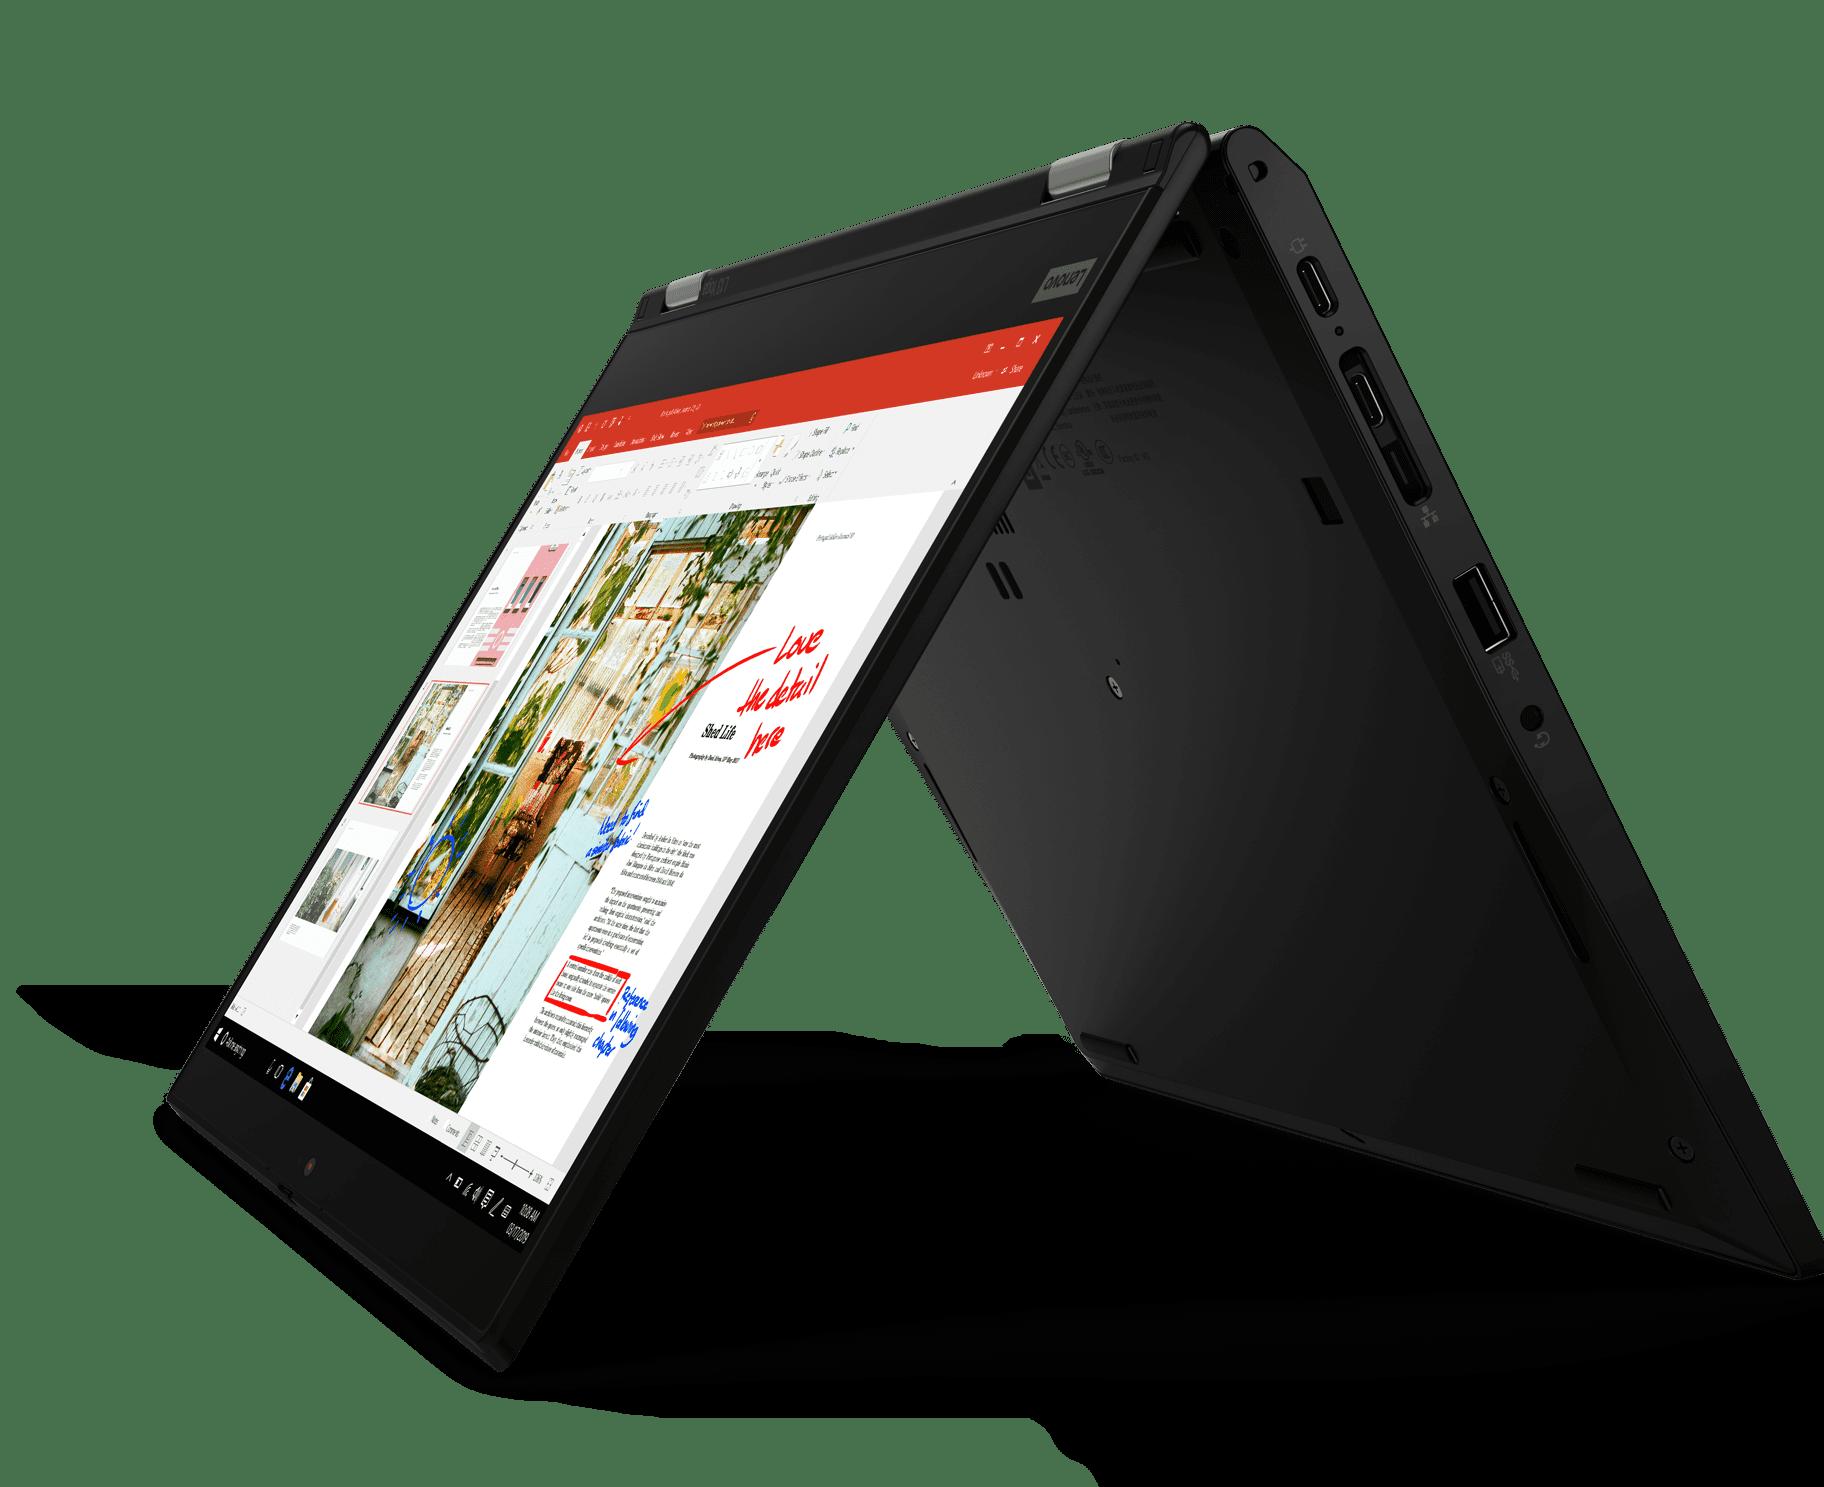 hinkPad-L13-Yoga-Tent-Mode